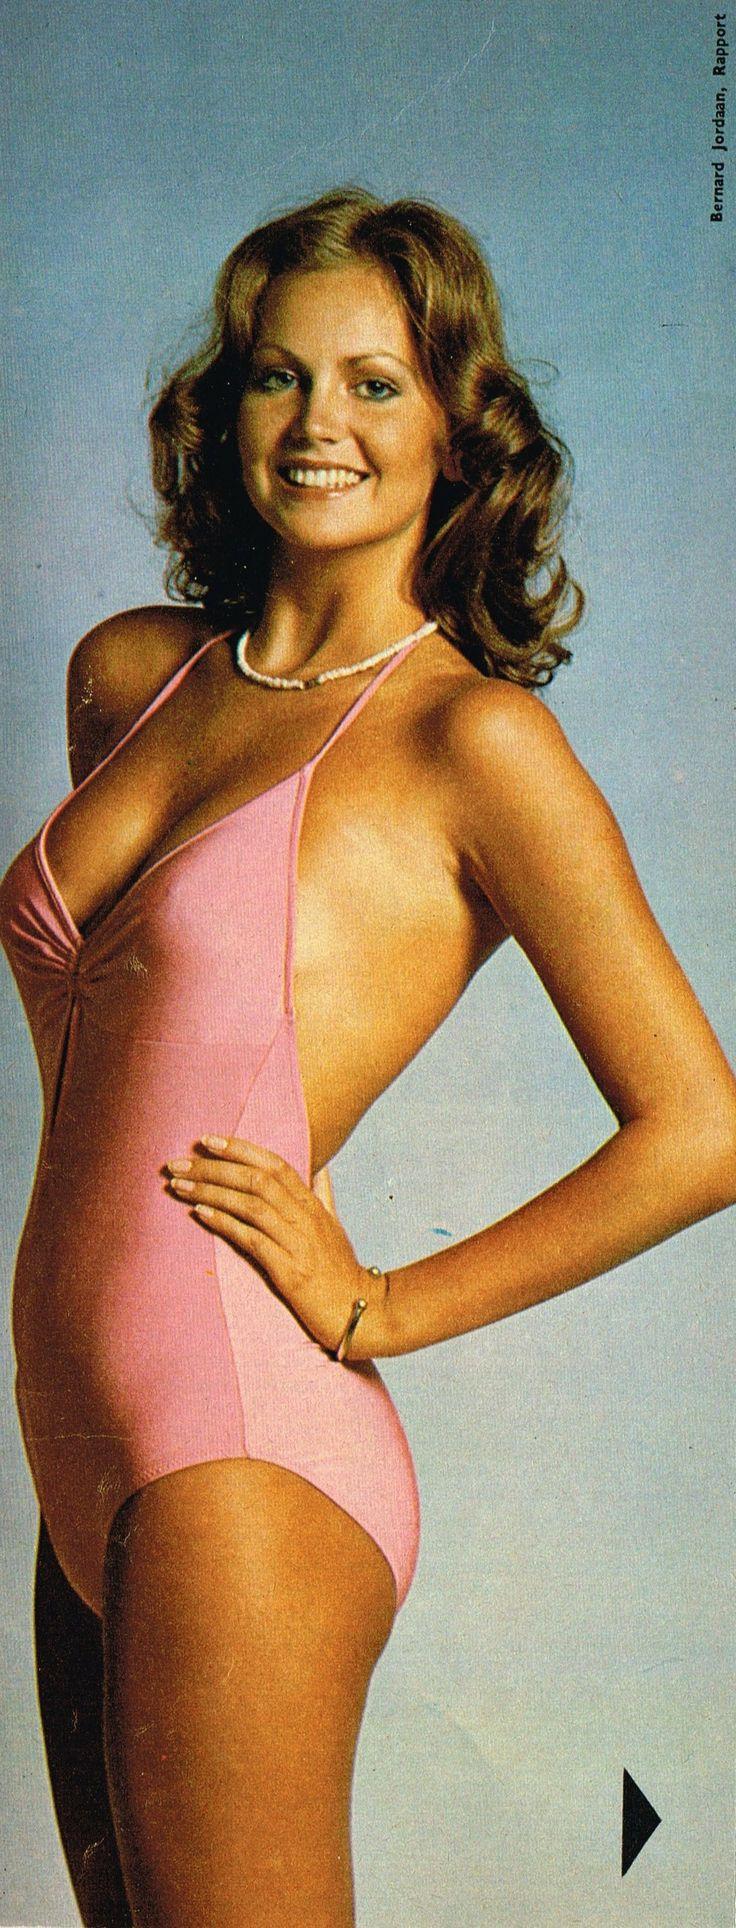 margaret gardiner, miss universe 1978. E8e40a10